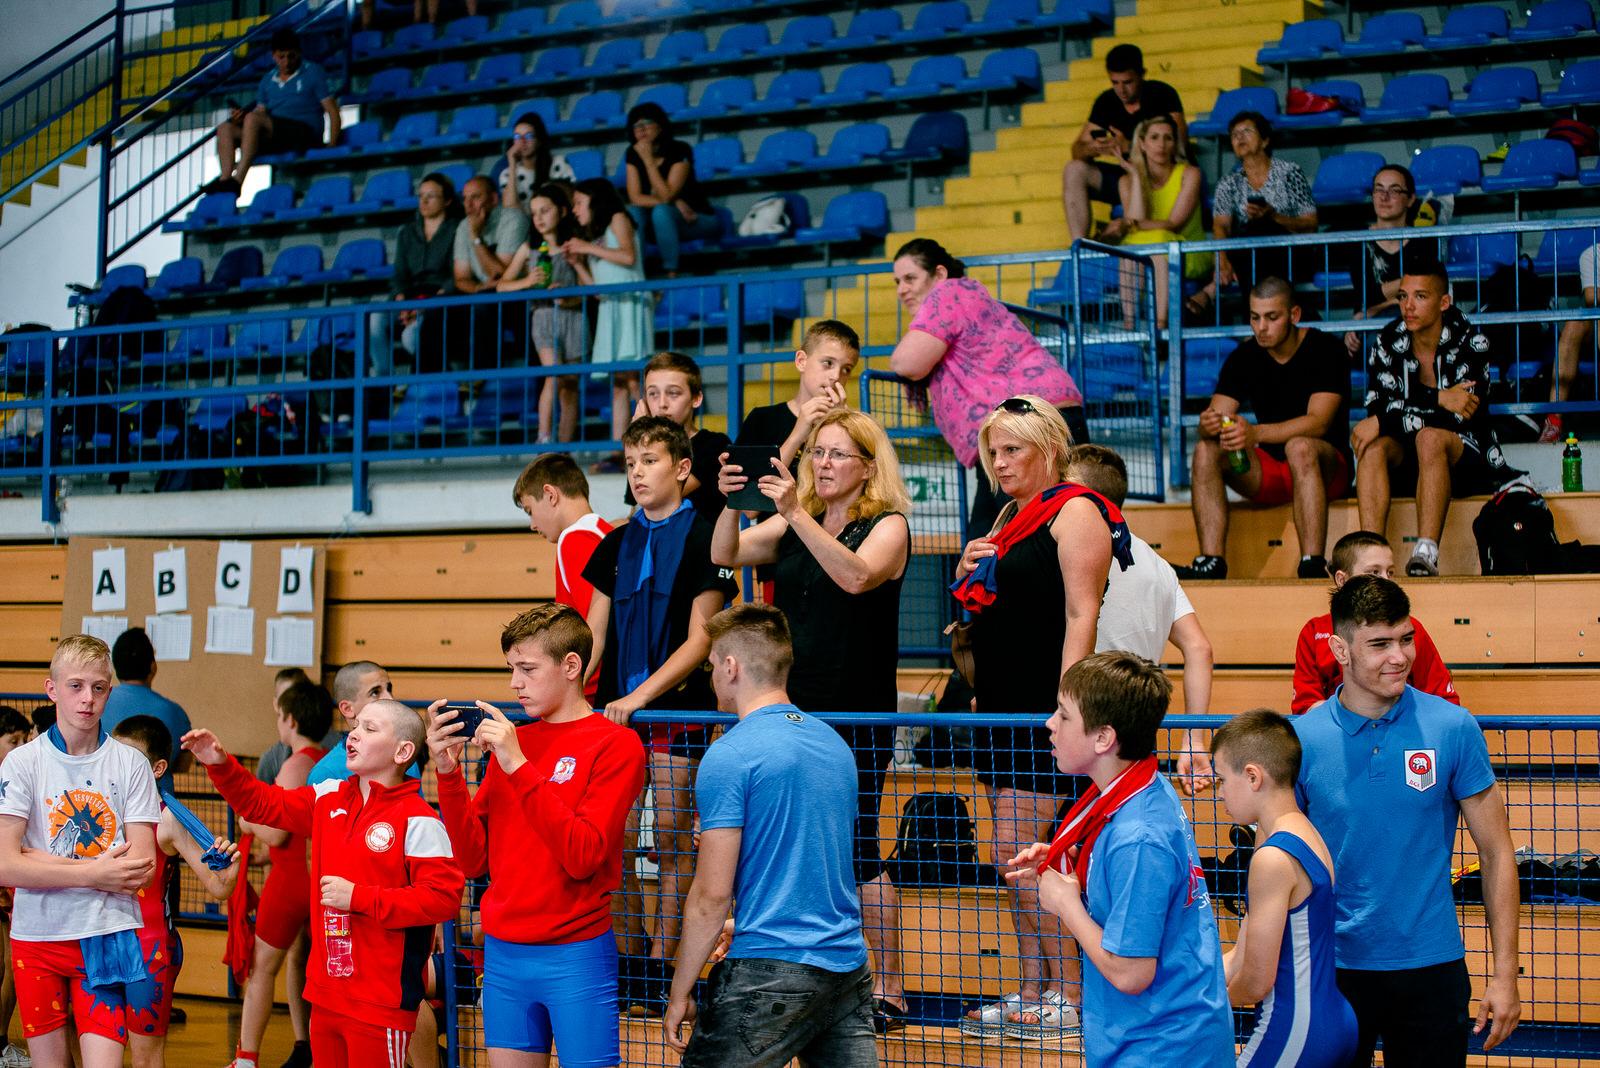 likaclub_gospić-open-hrvanje_2019-47